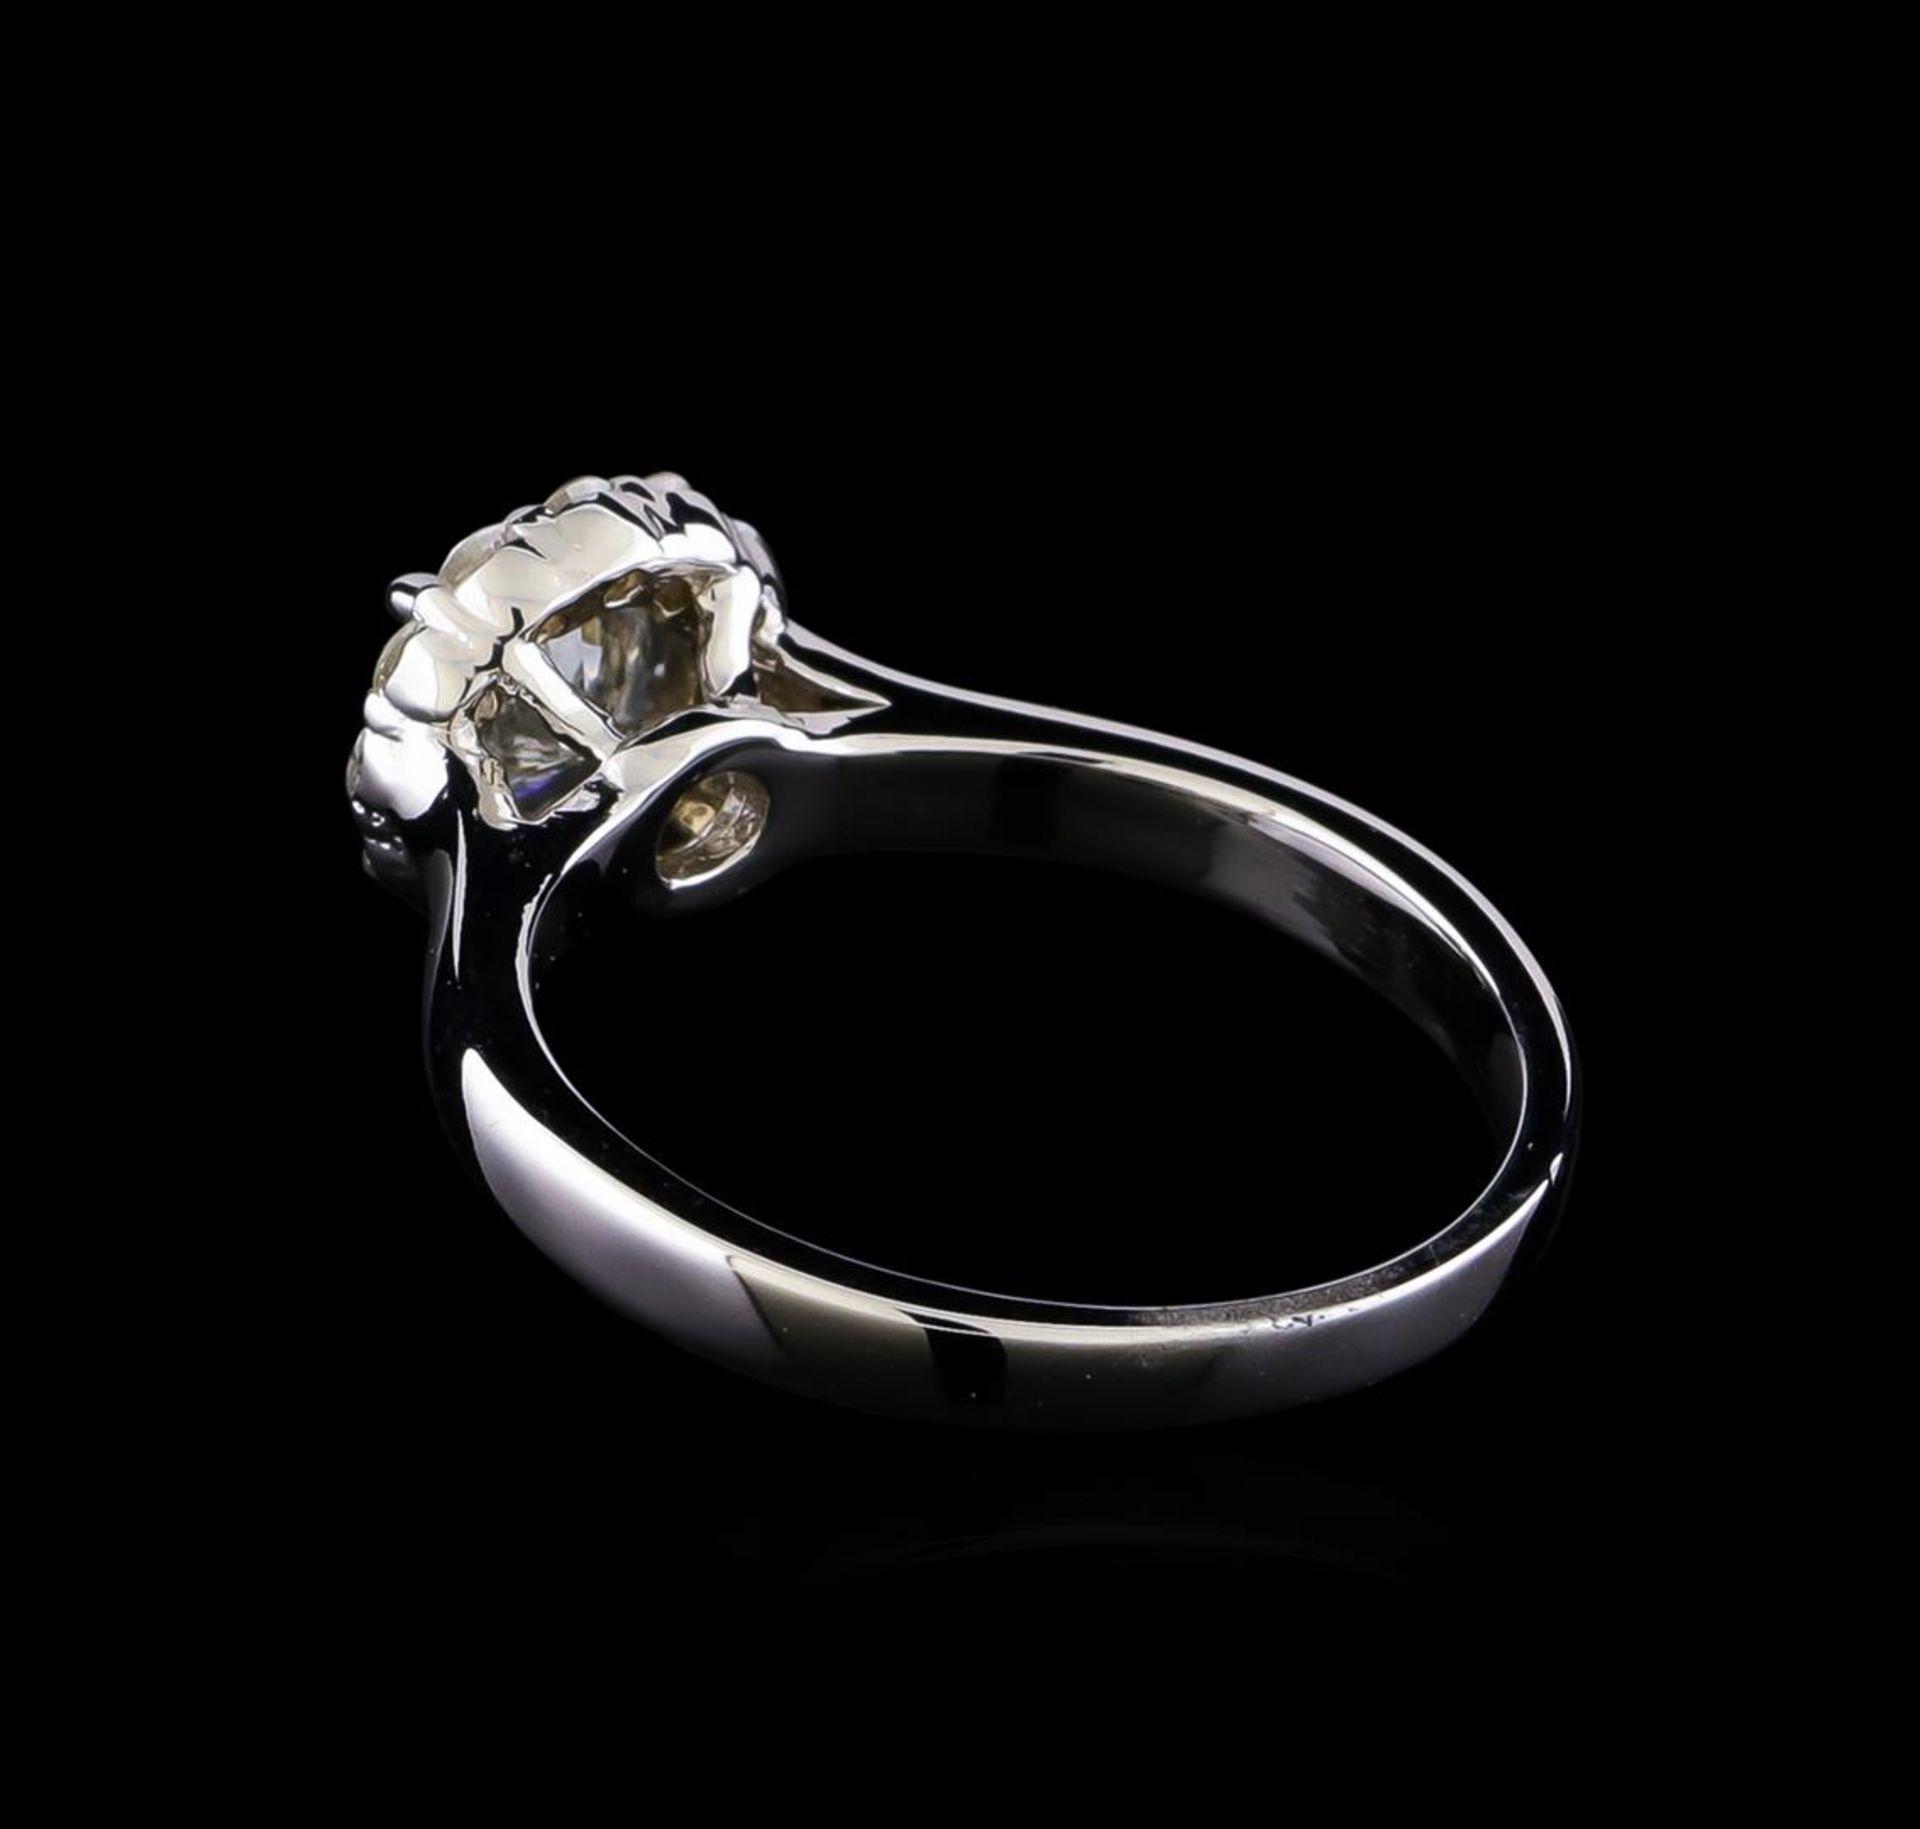 0.99 ctw Diamond Ring - 14KT White Gold - Image 3 of 5